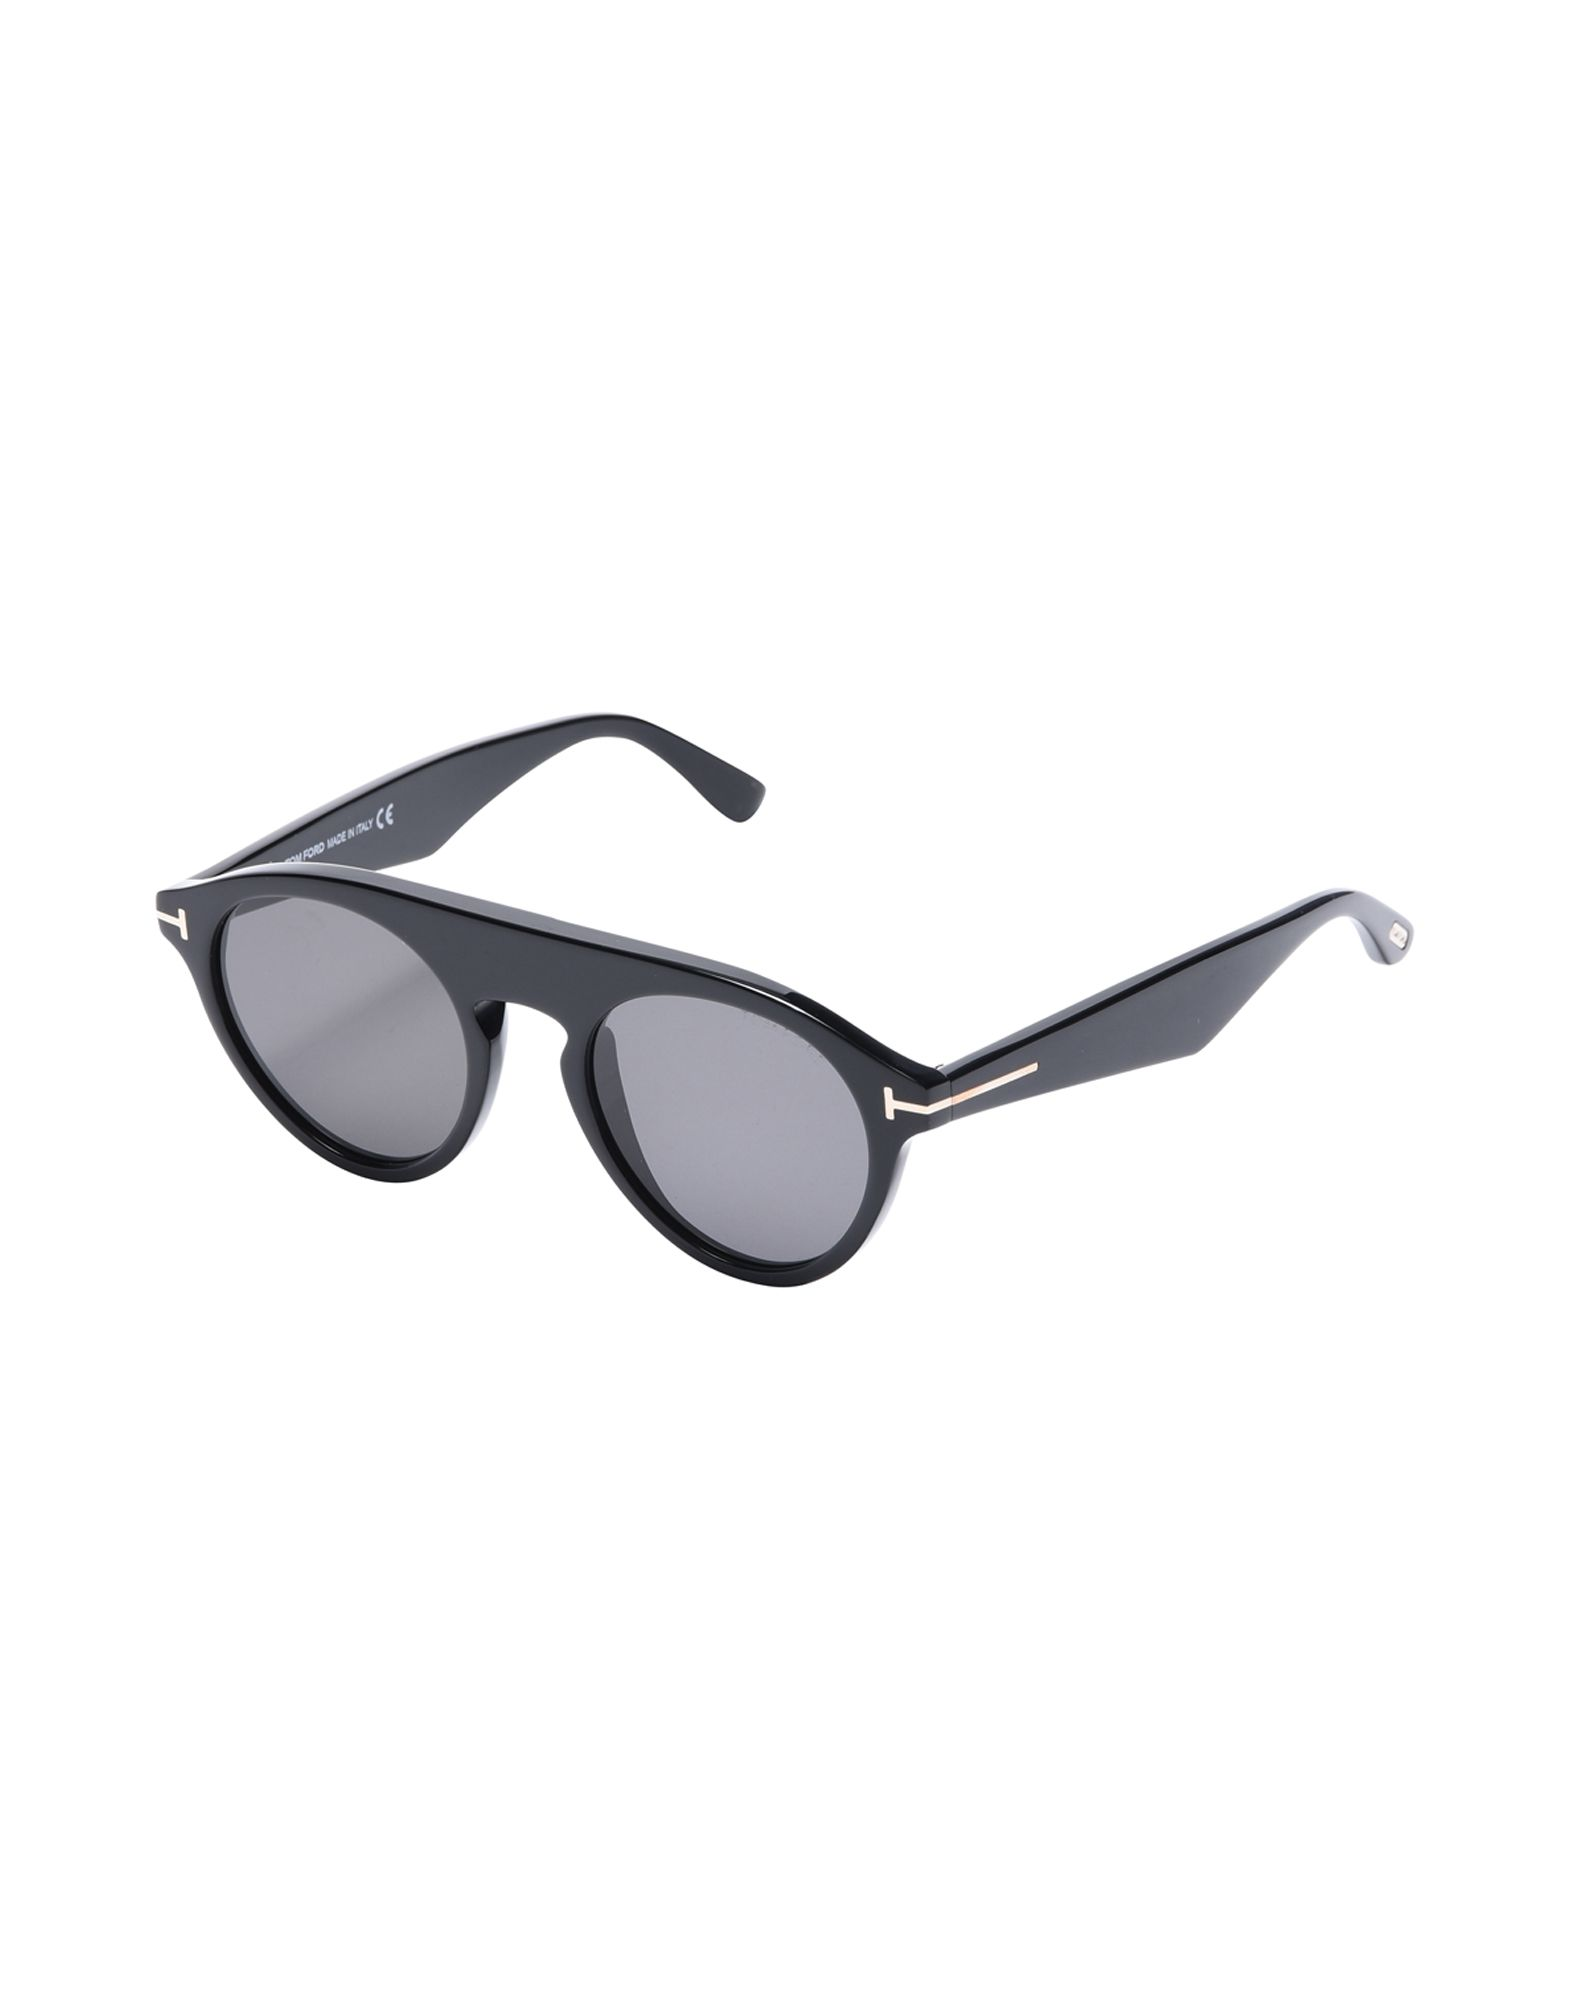 TOM FORD Солнечные очки tom ford tom ford noir парфюмерная вода спрей tom ford noir парфюмерная вода спрей